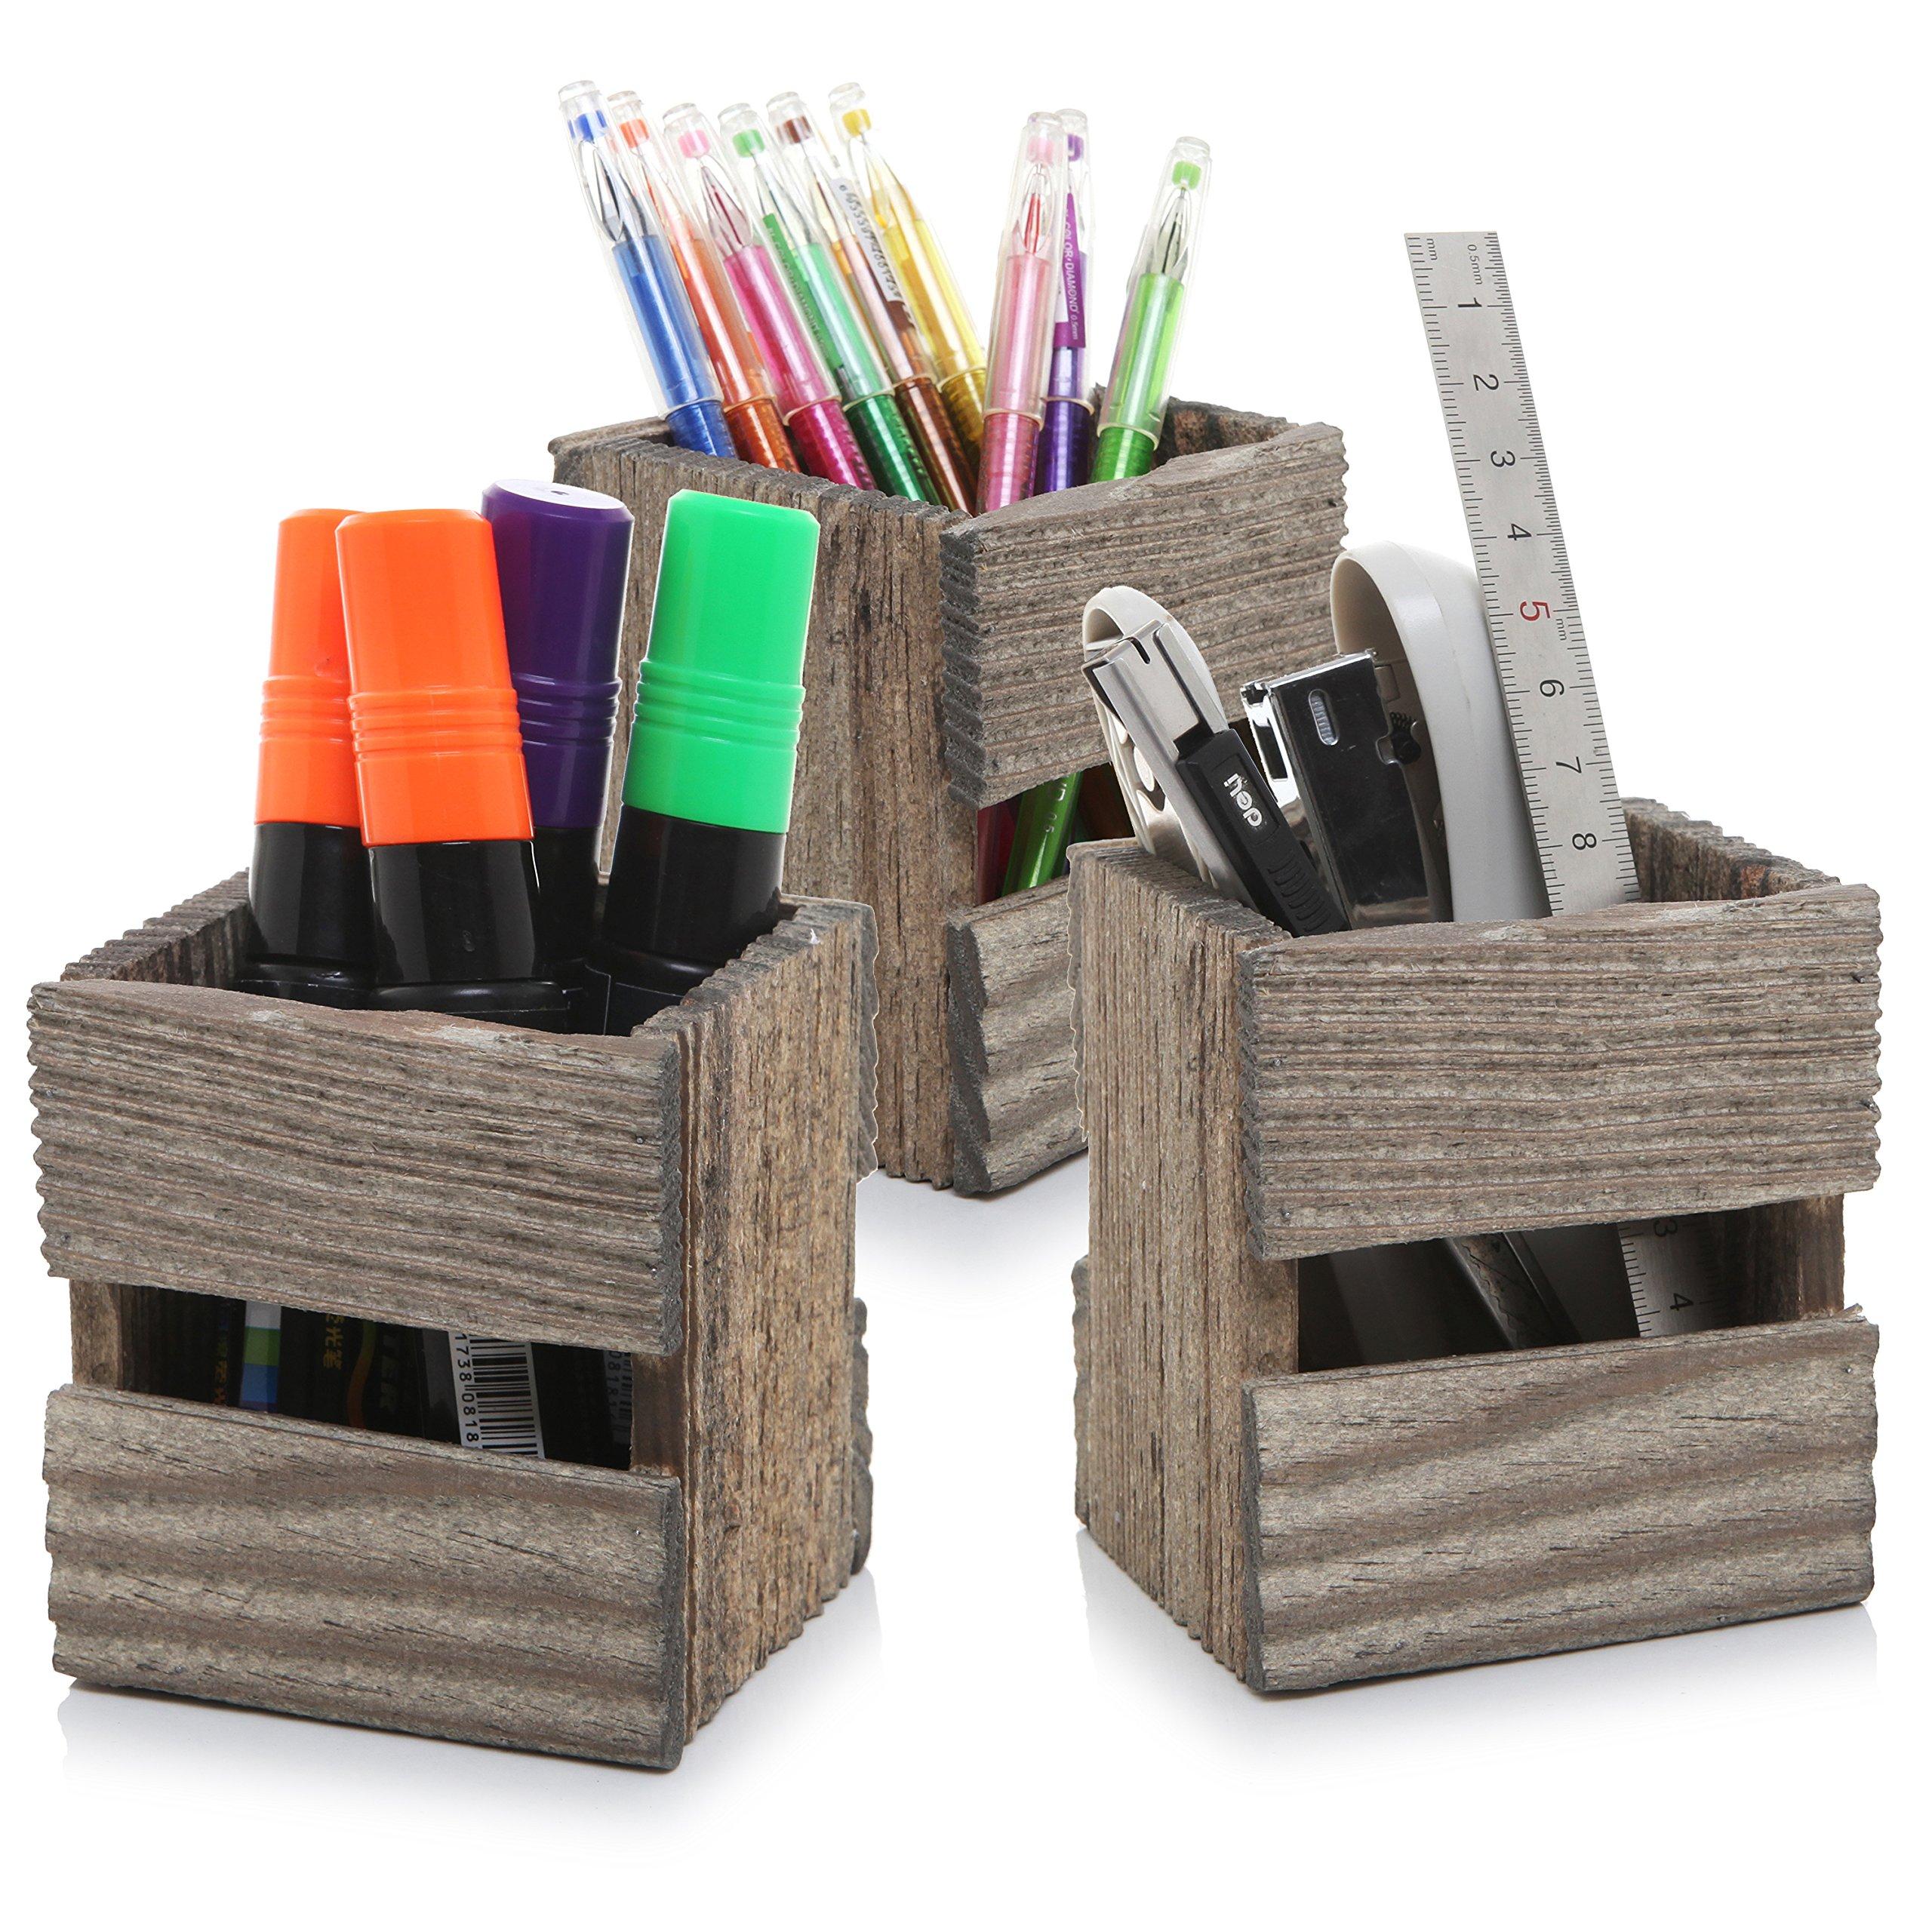 MyGift Set of 3 Crate Design Pen & Pencil Holders, Wood Office Desk Storage Boxes